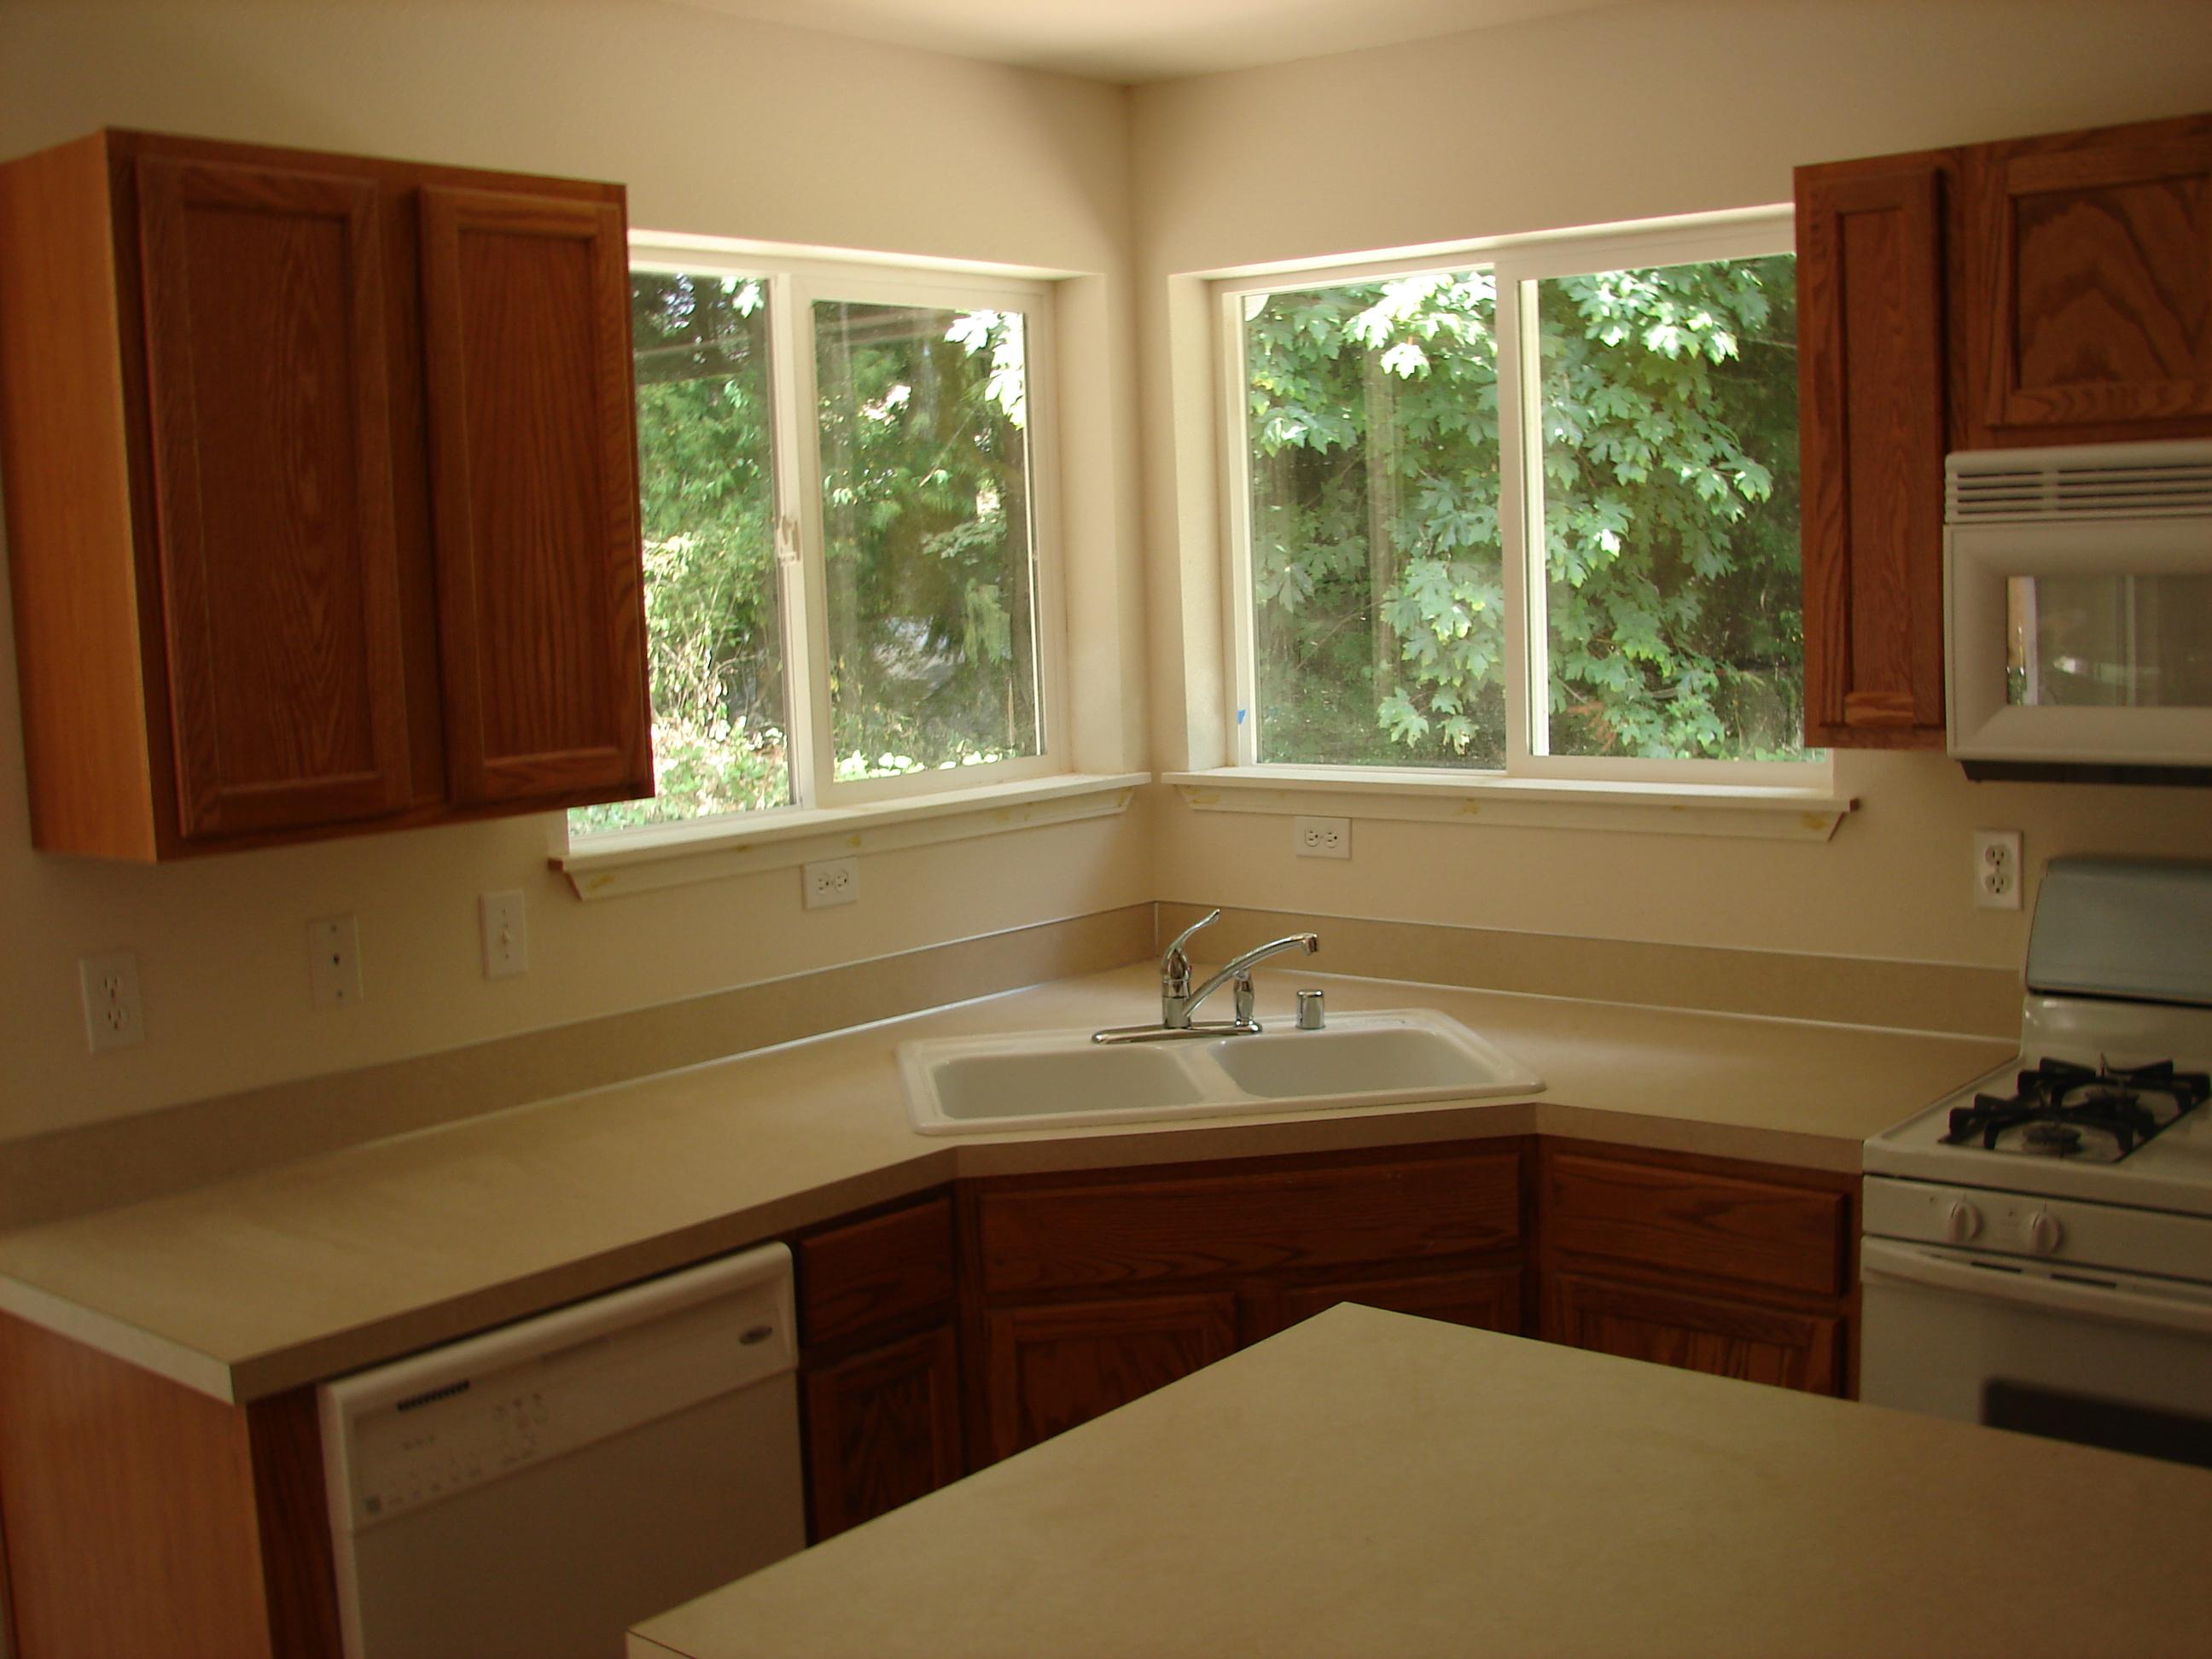 Window kitchen Photo - 8